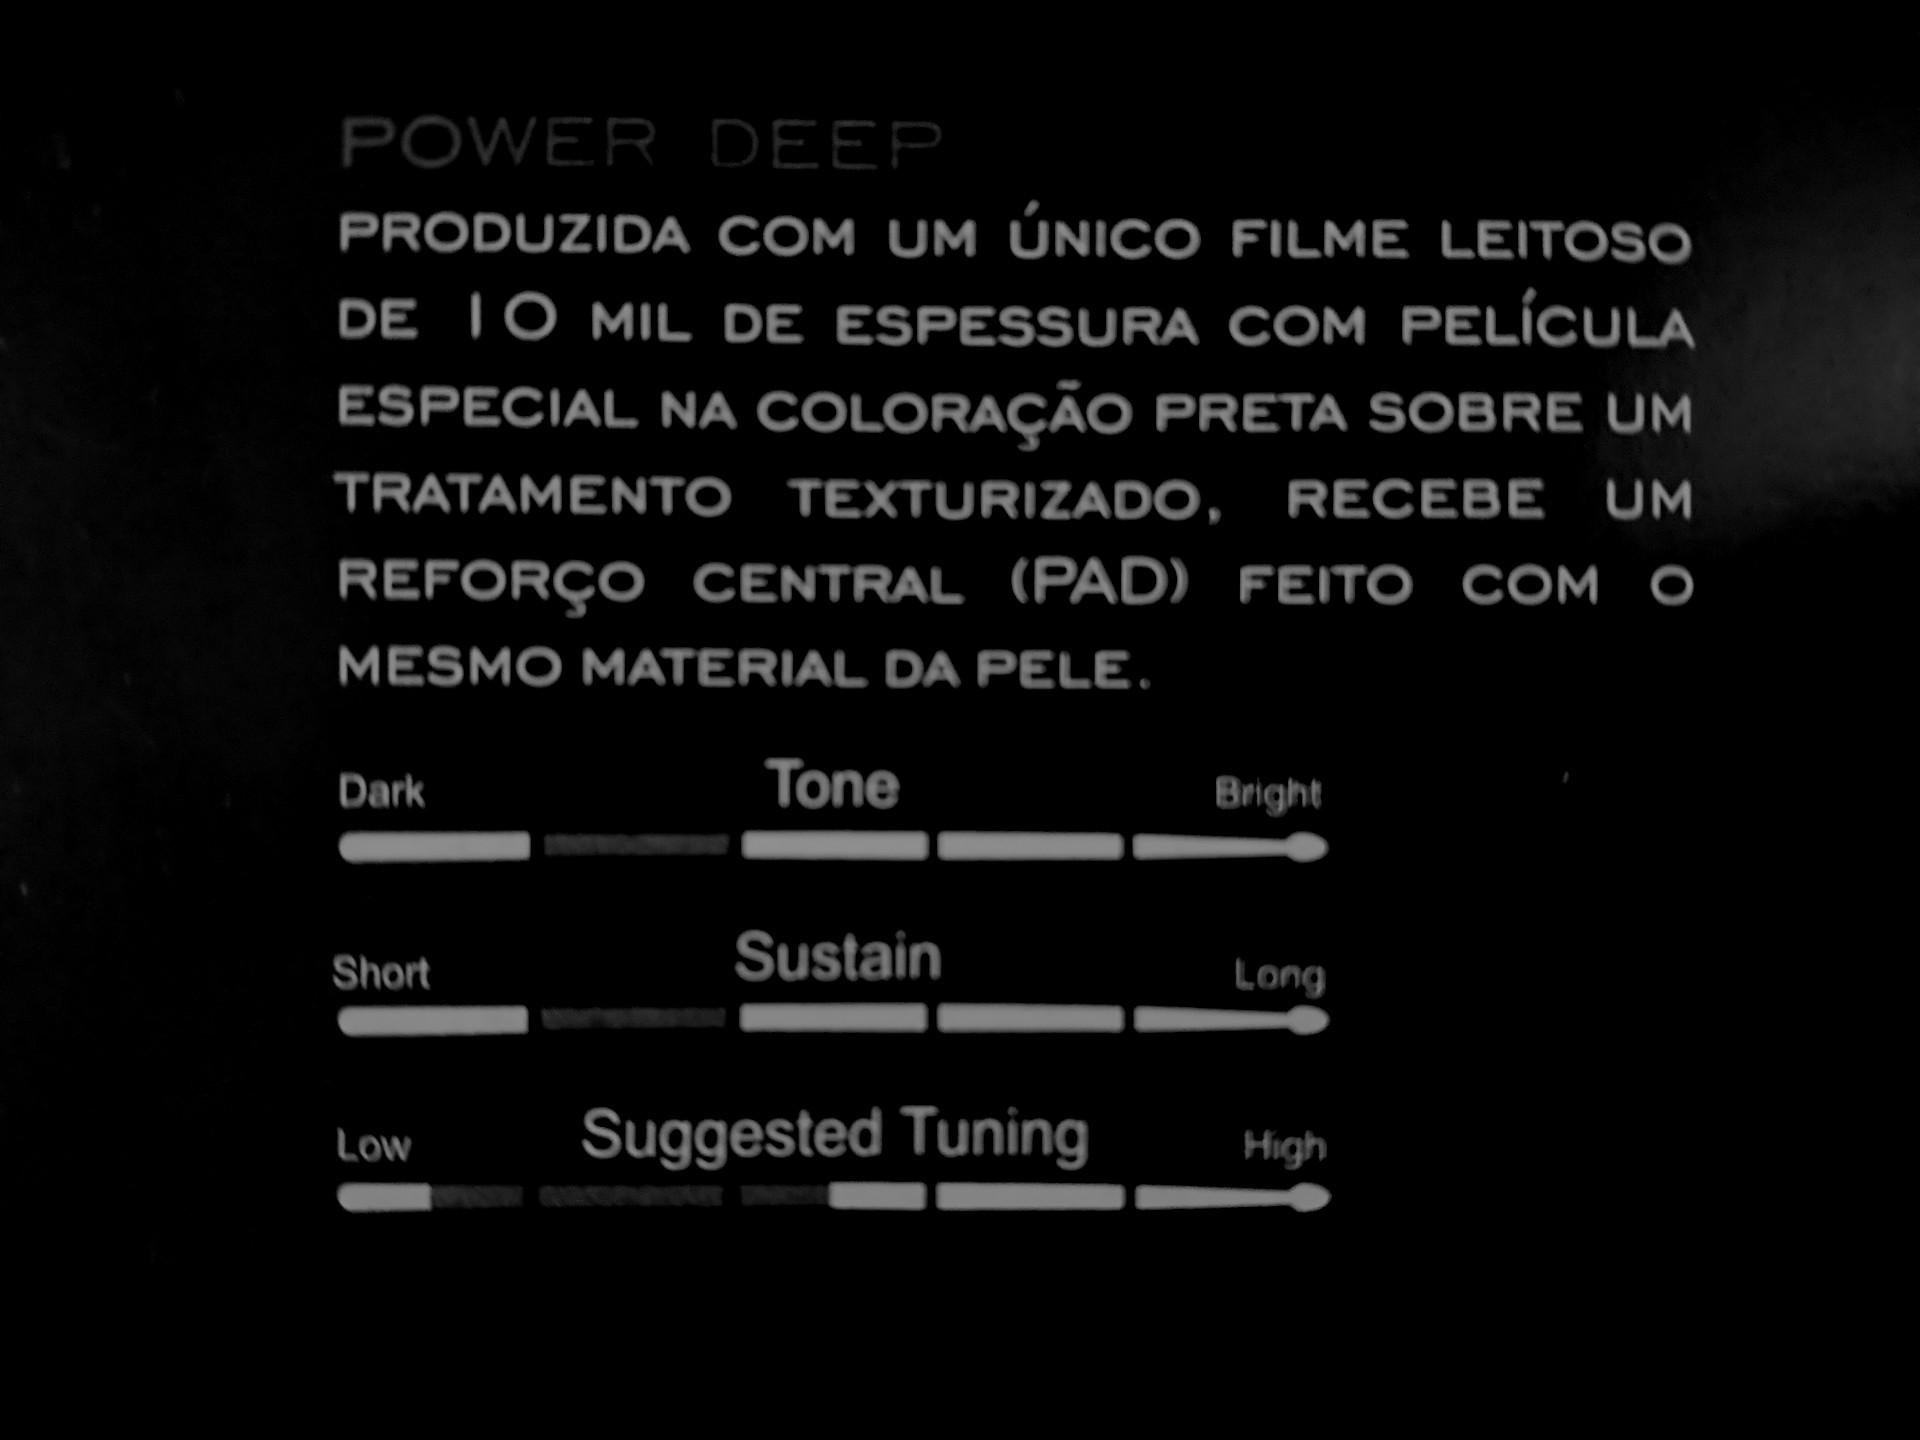 "Pele texturizada POWER DEEP C/ PAD 10"" Dudu Portes, LUEN."